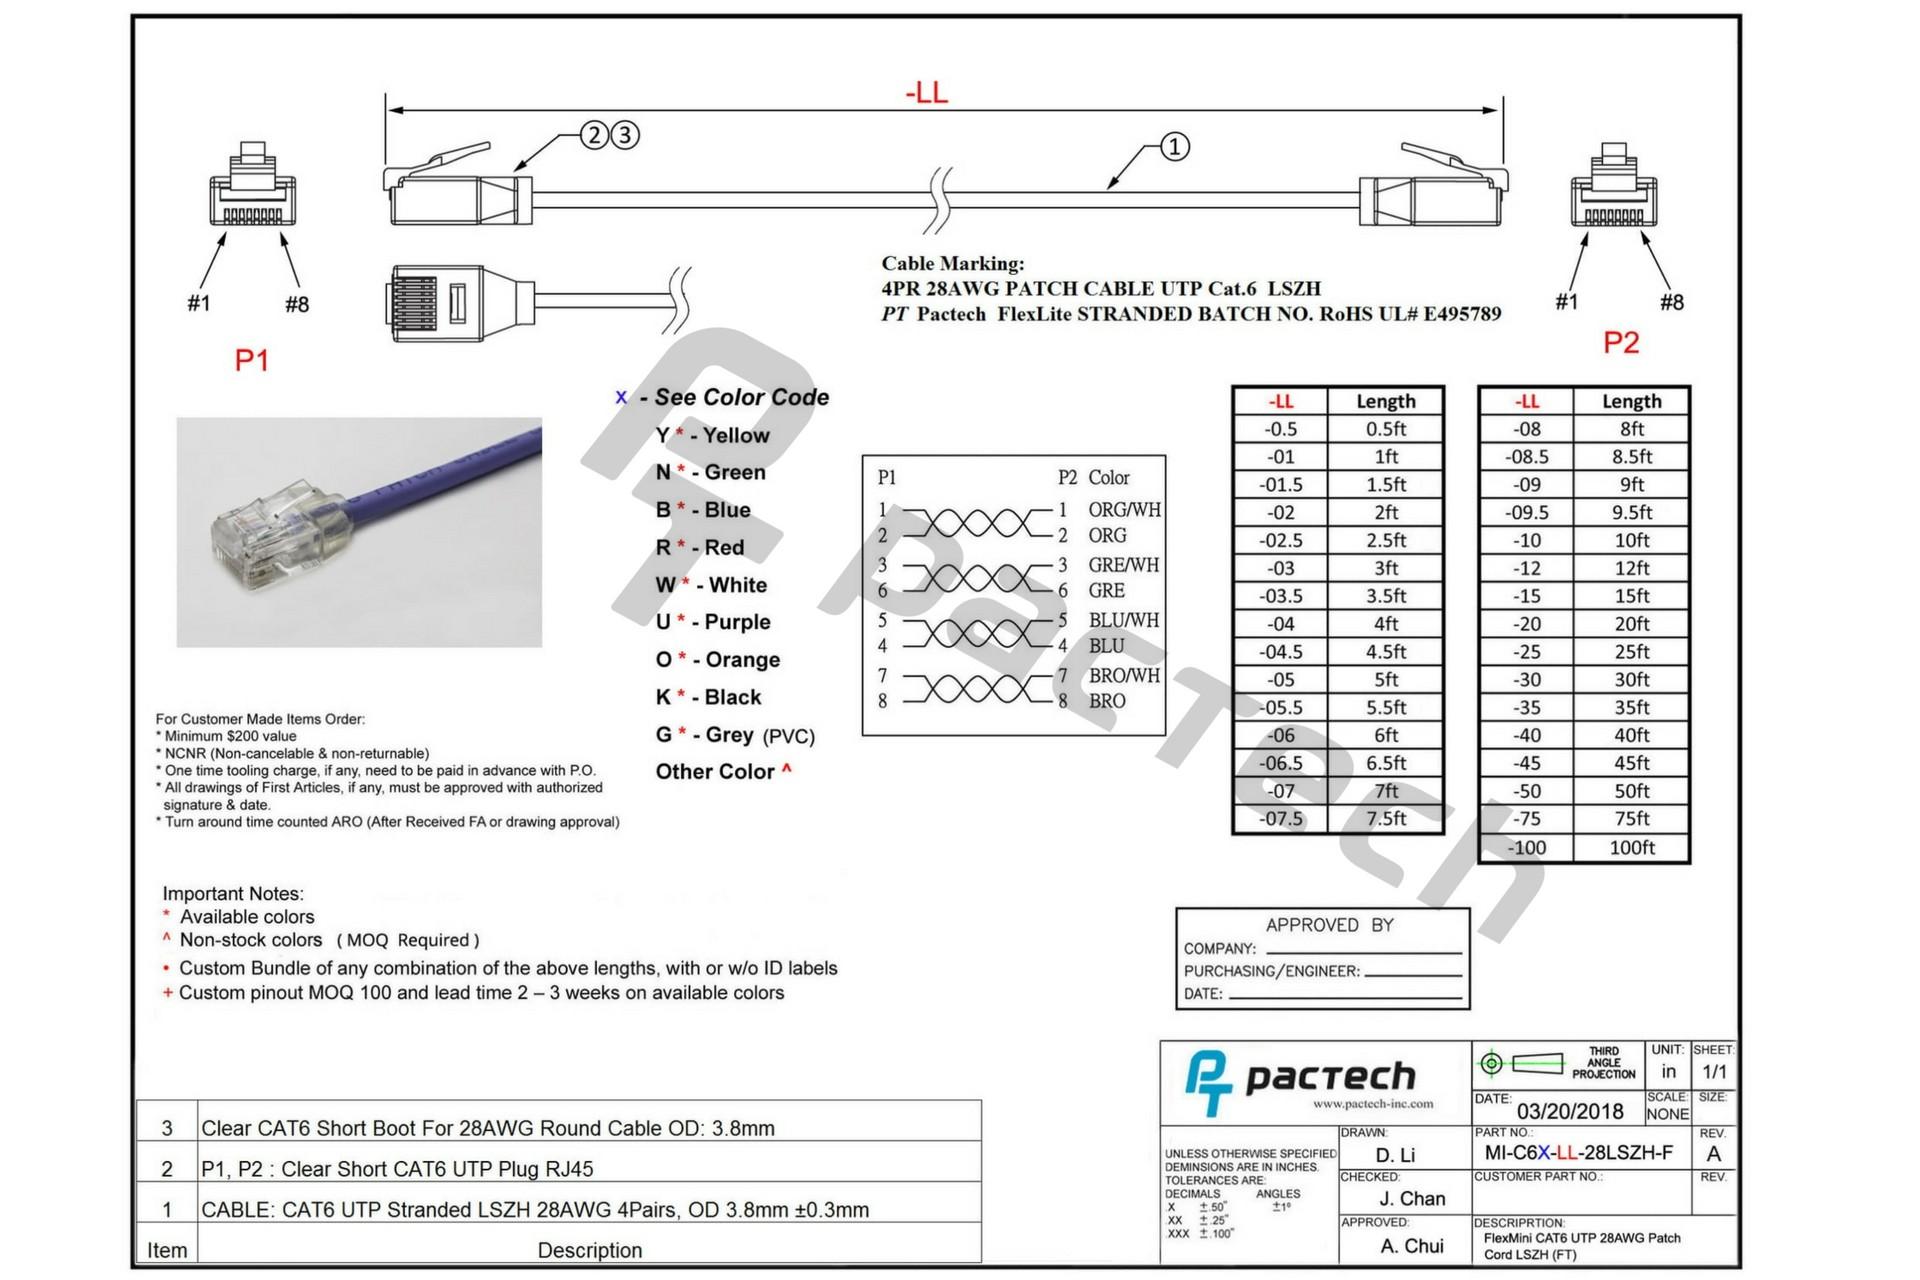 Cat6e Wiring Diagram : Cat e wiring diagram inspirational image